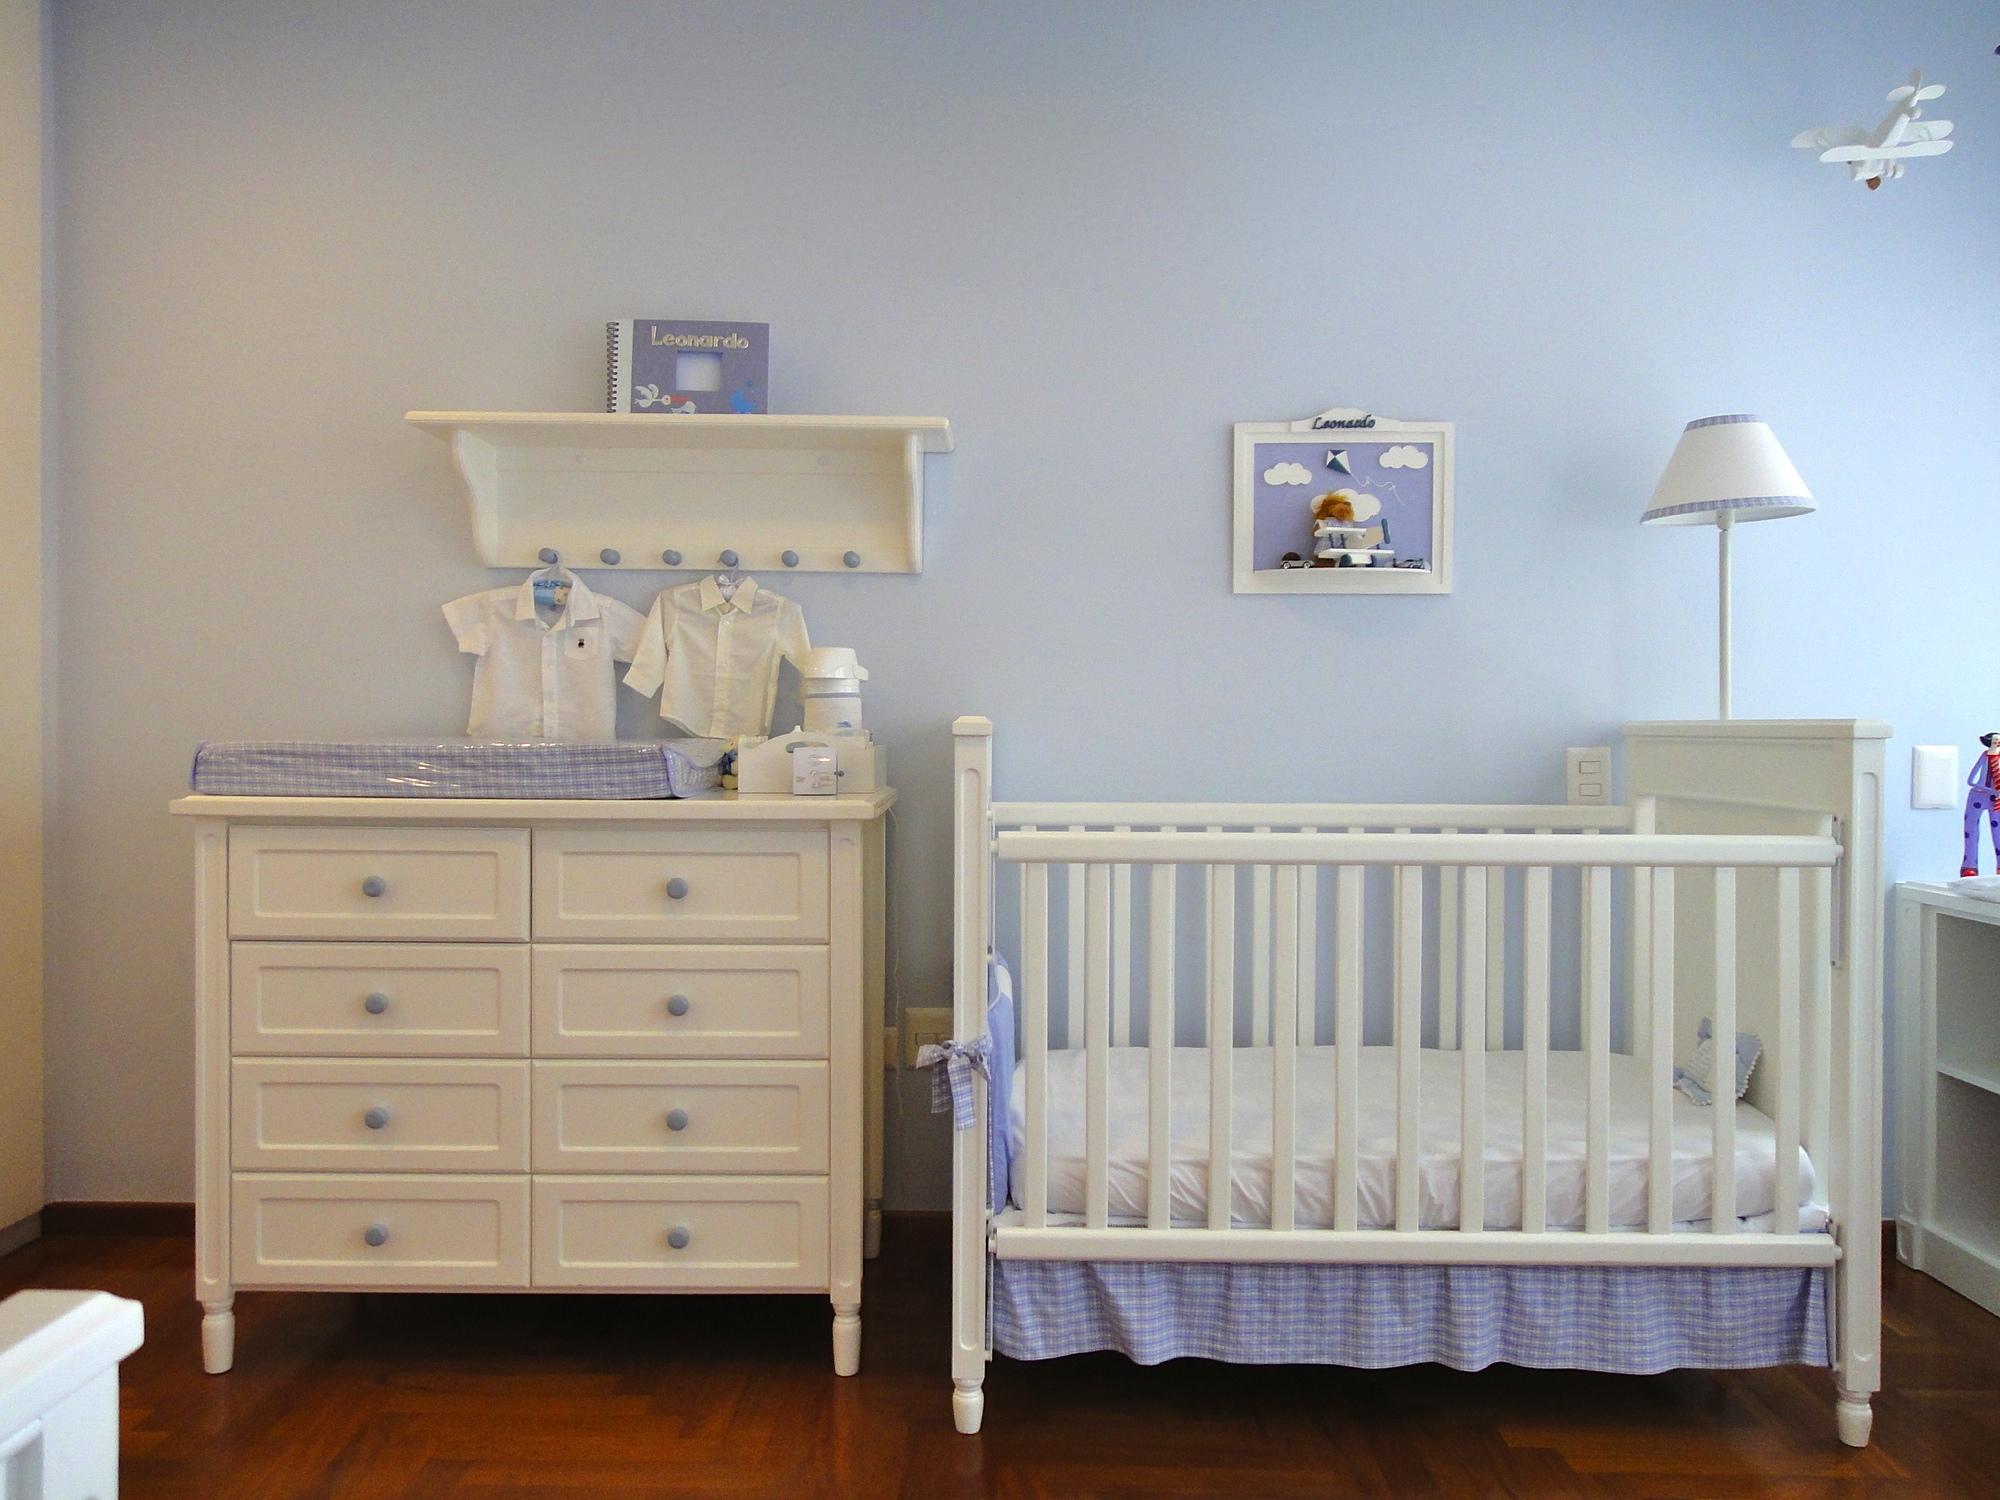 quarto de bebê funcional